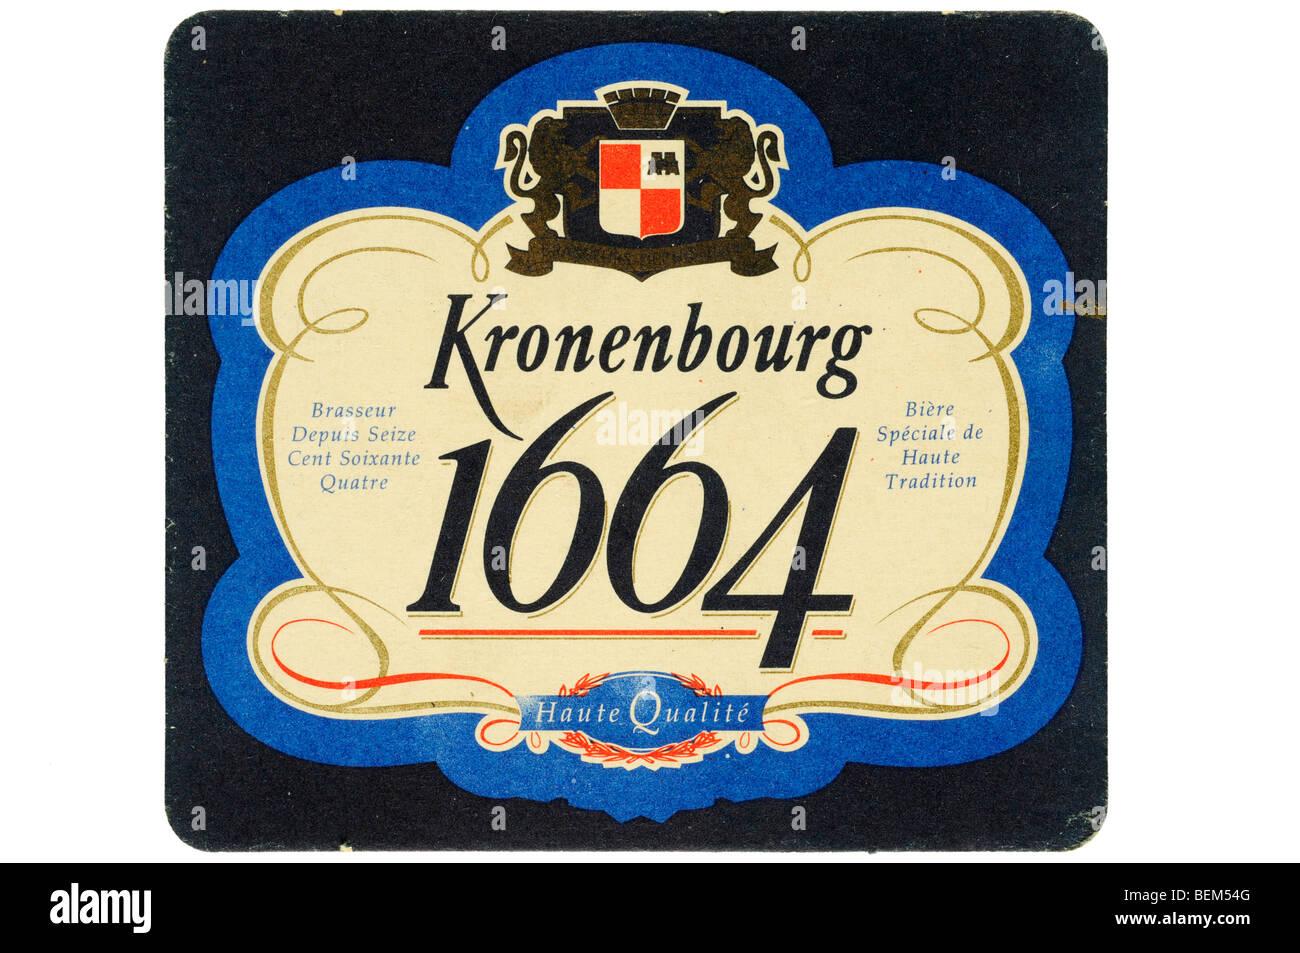 kronenbourg 1664 - Stock Image